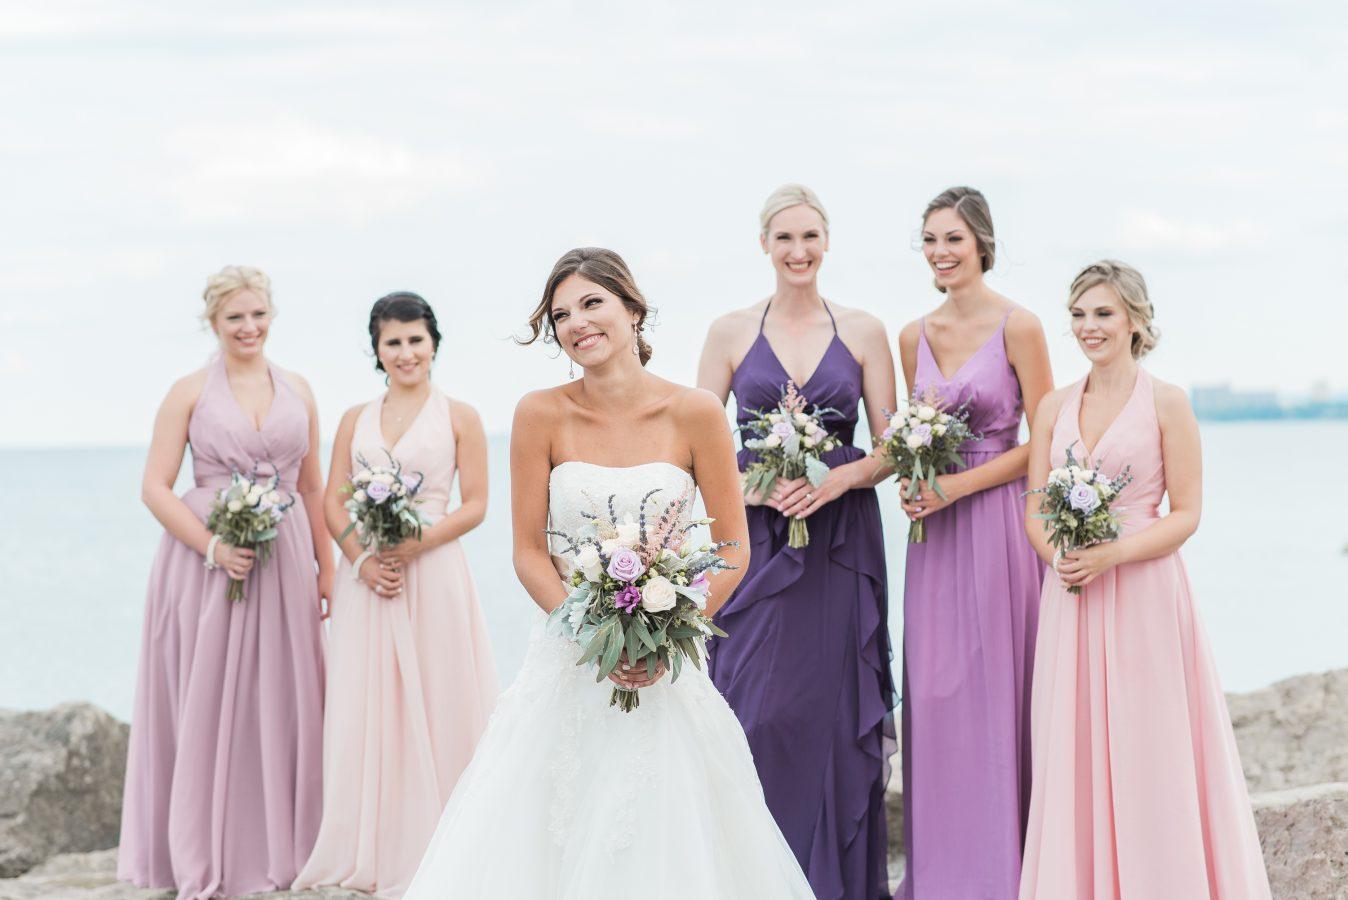 bridal party at lakeview burlington